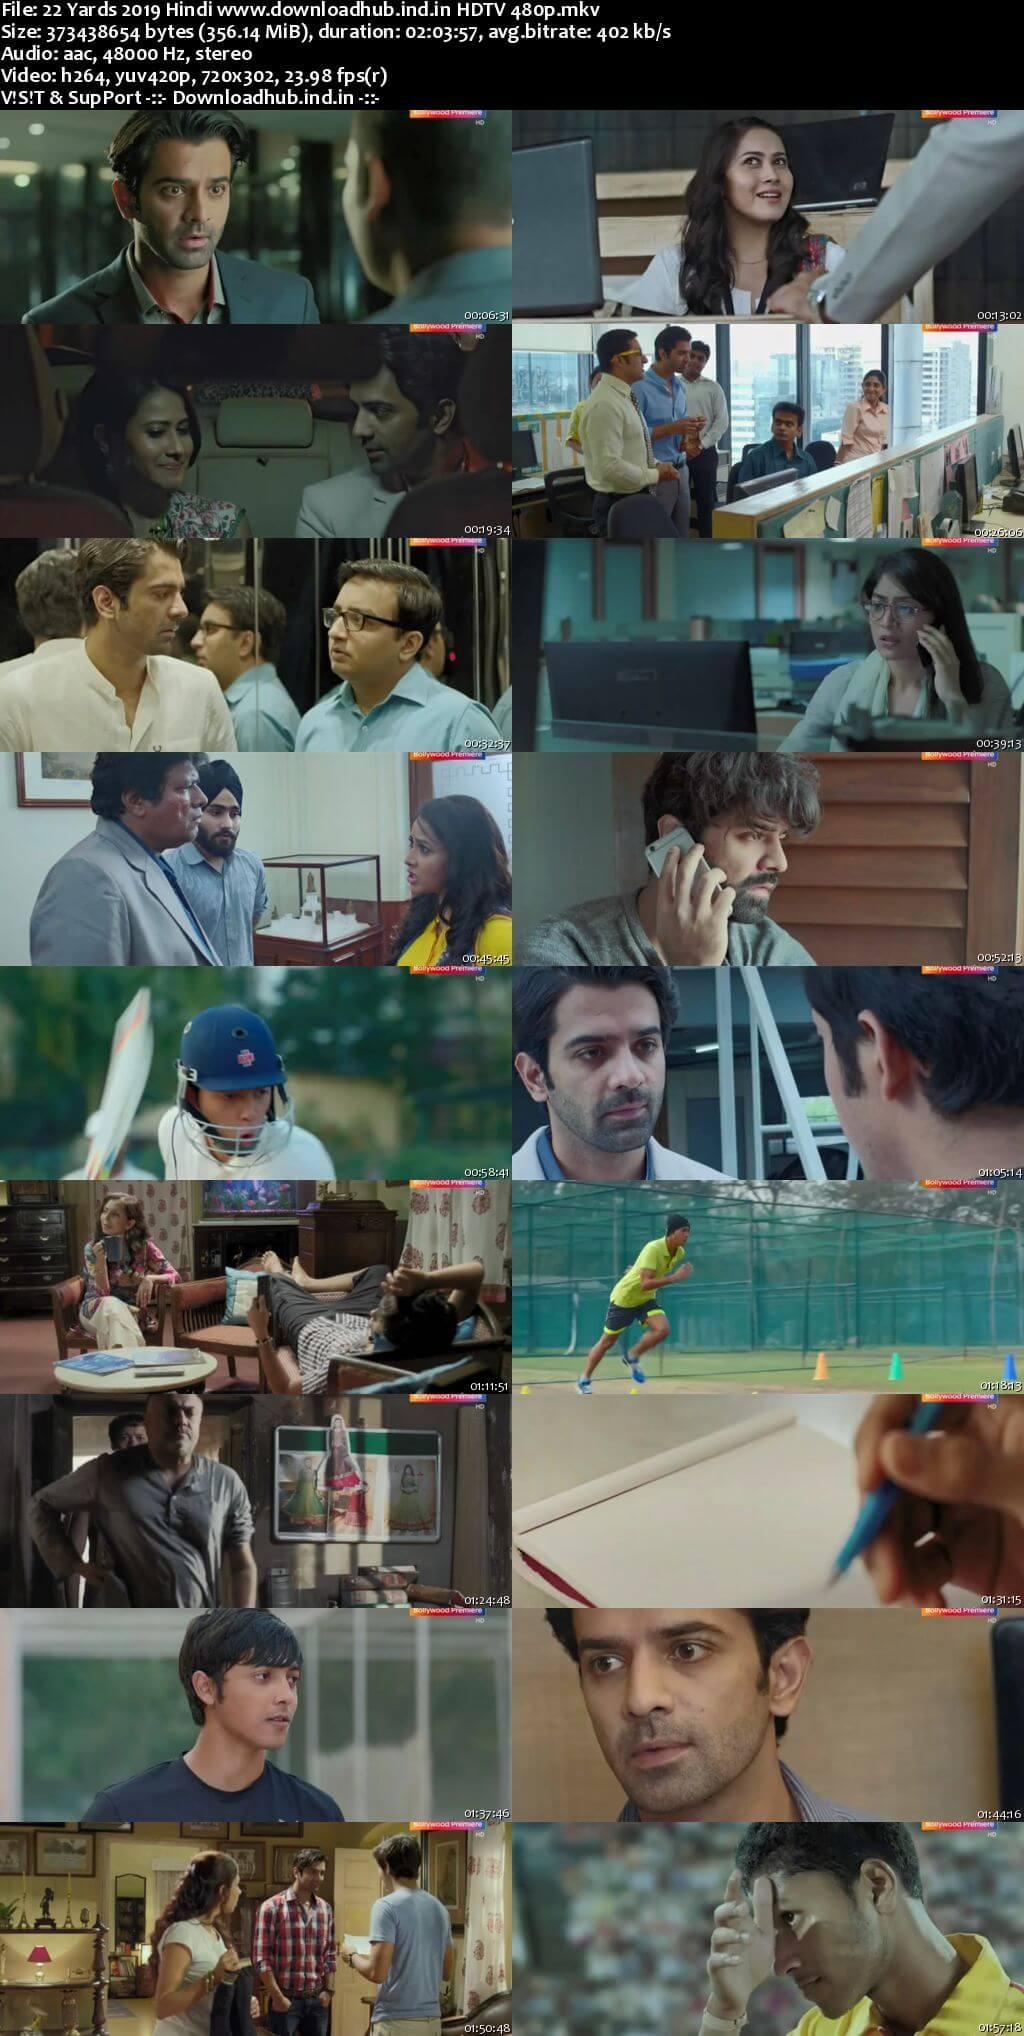 22 Yards 2019 Hindi 350MB HDTV 480p